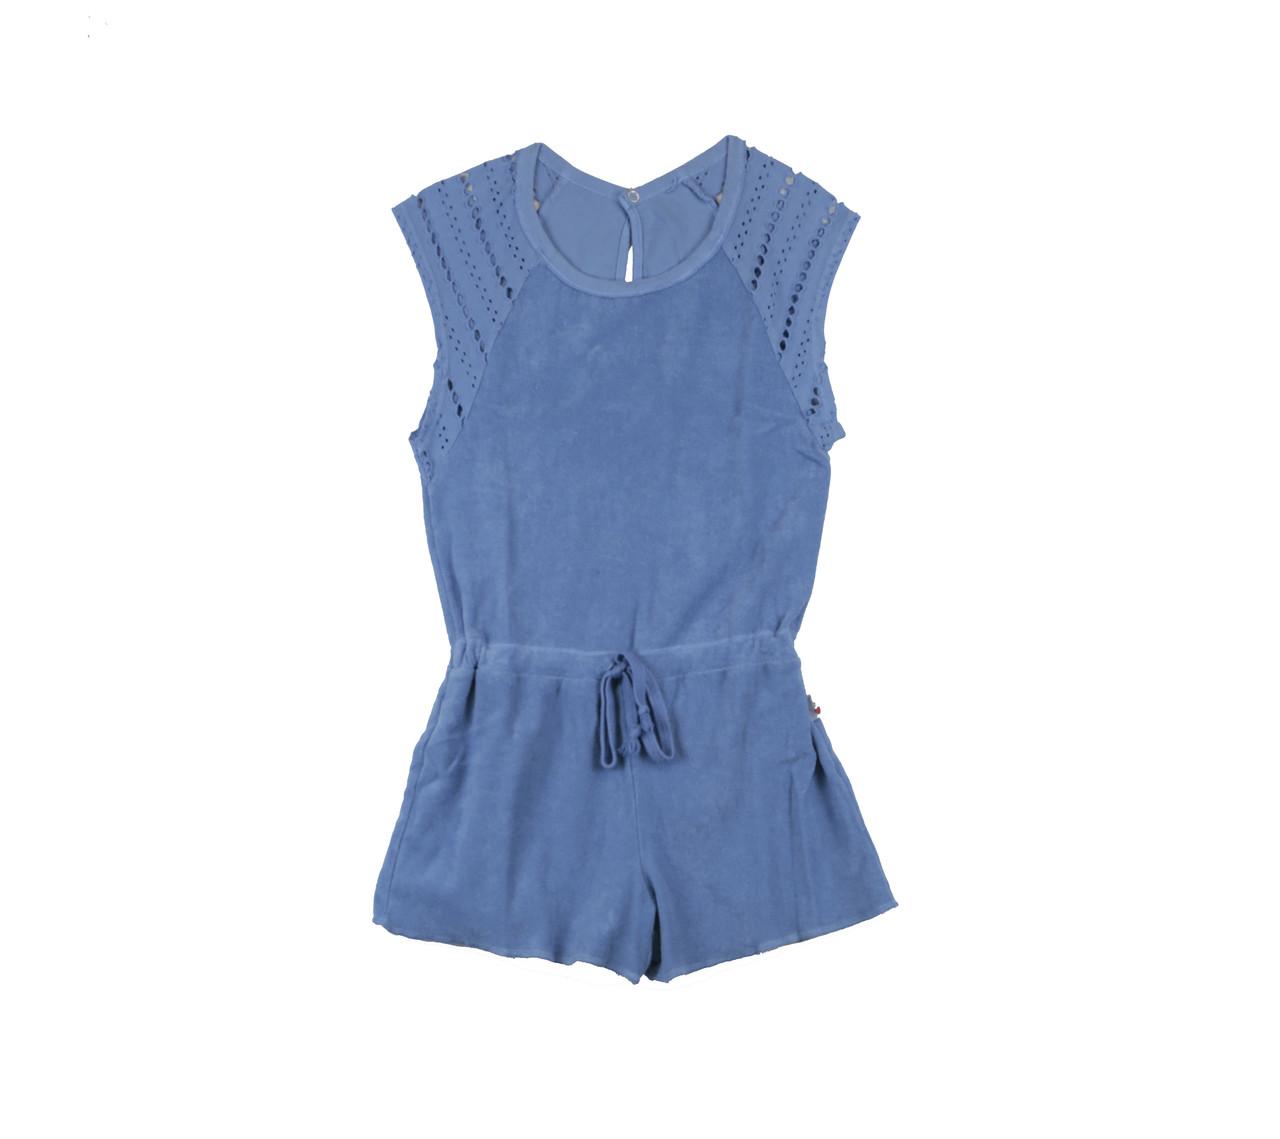 e6c4952f33 GIRLS TERRY CLOTH COTTON ROMPER WITH CROCHET CONTRAST - T2love Inc.